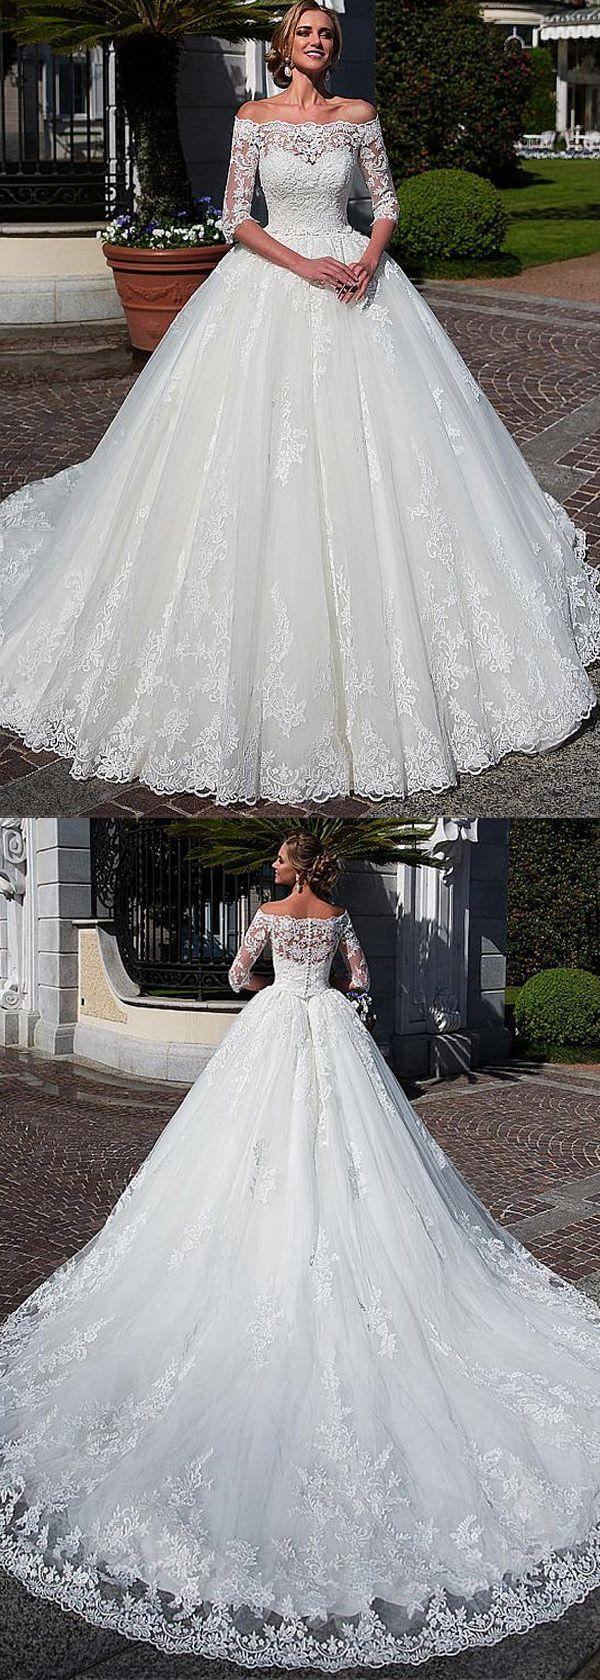 Attraktives Tüll off-the-neck Ausschnitt Ballkleid Brautkleid mit Spitzen Applikationen & Beadings & abnehmbare Jacke #tulleballgown